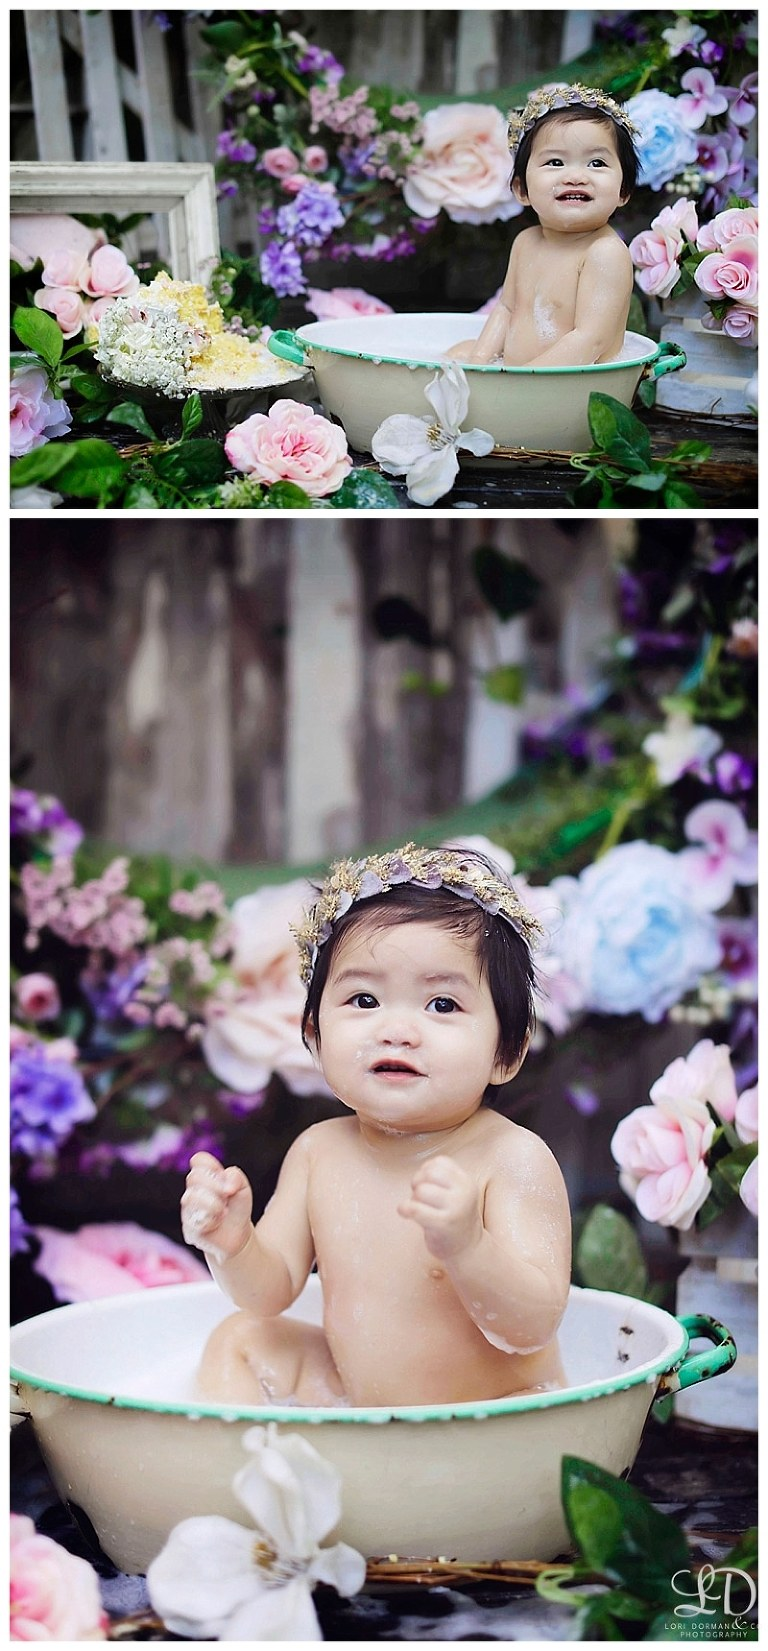 adorable family shoot-family photographer-children photographer-professional photographer-lori dorman photograpy_1299.jpg